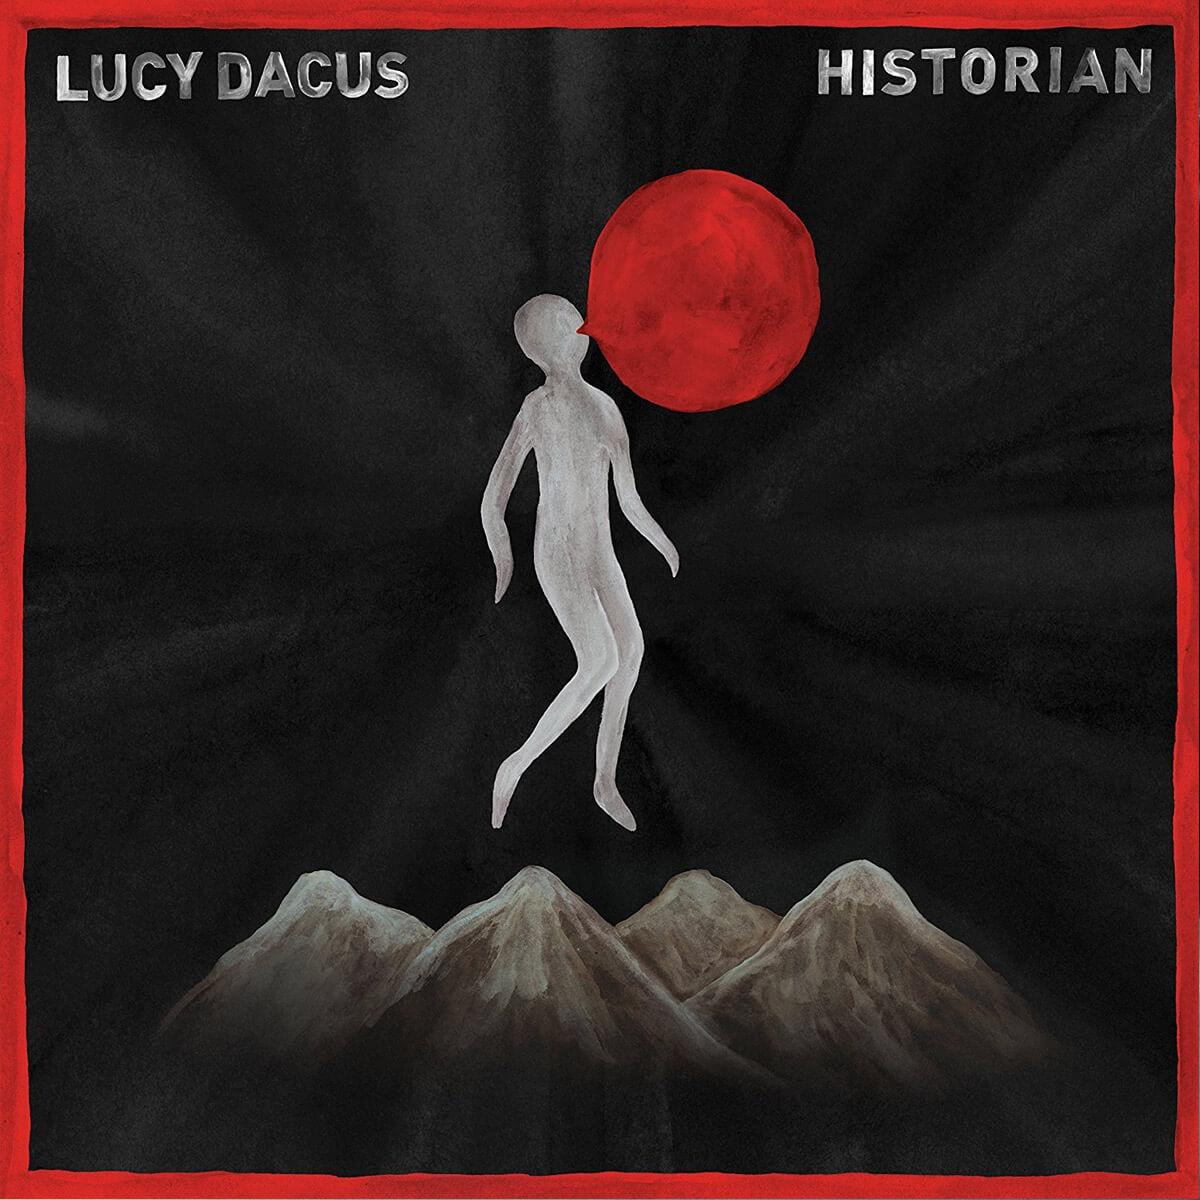 Discos 2018 - Historian